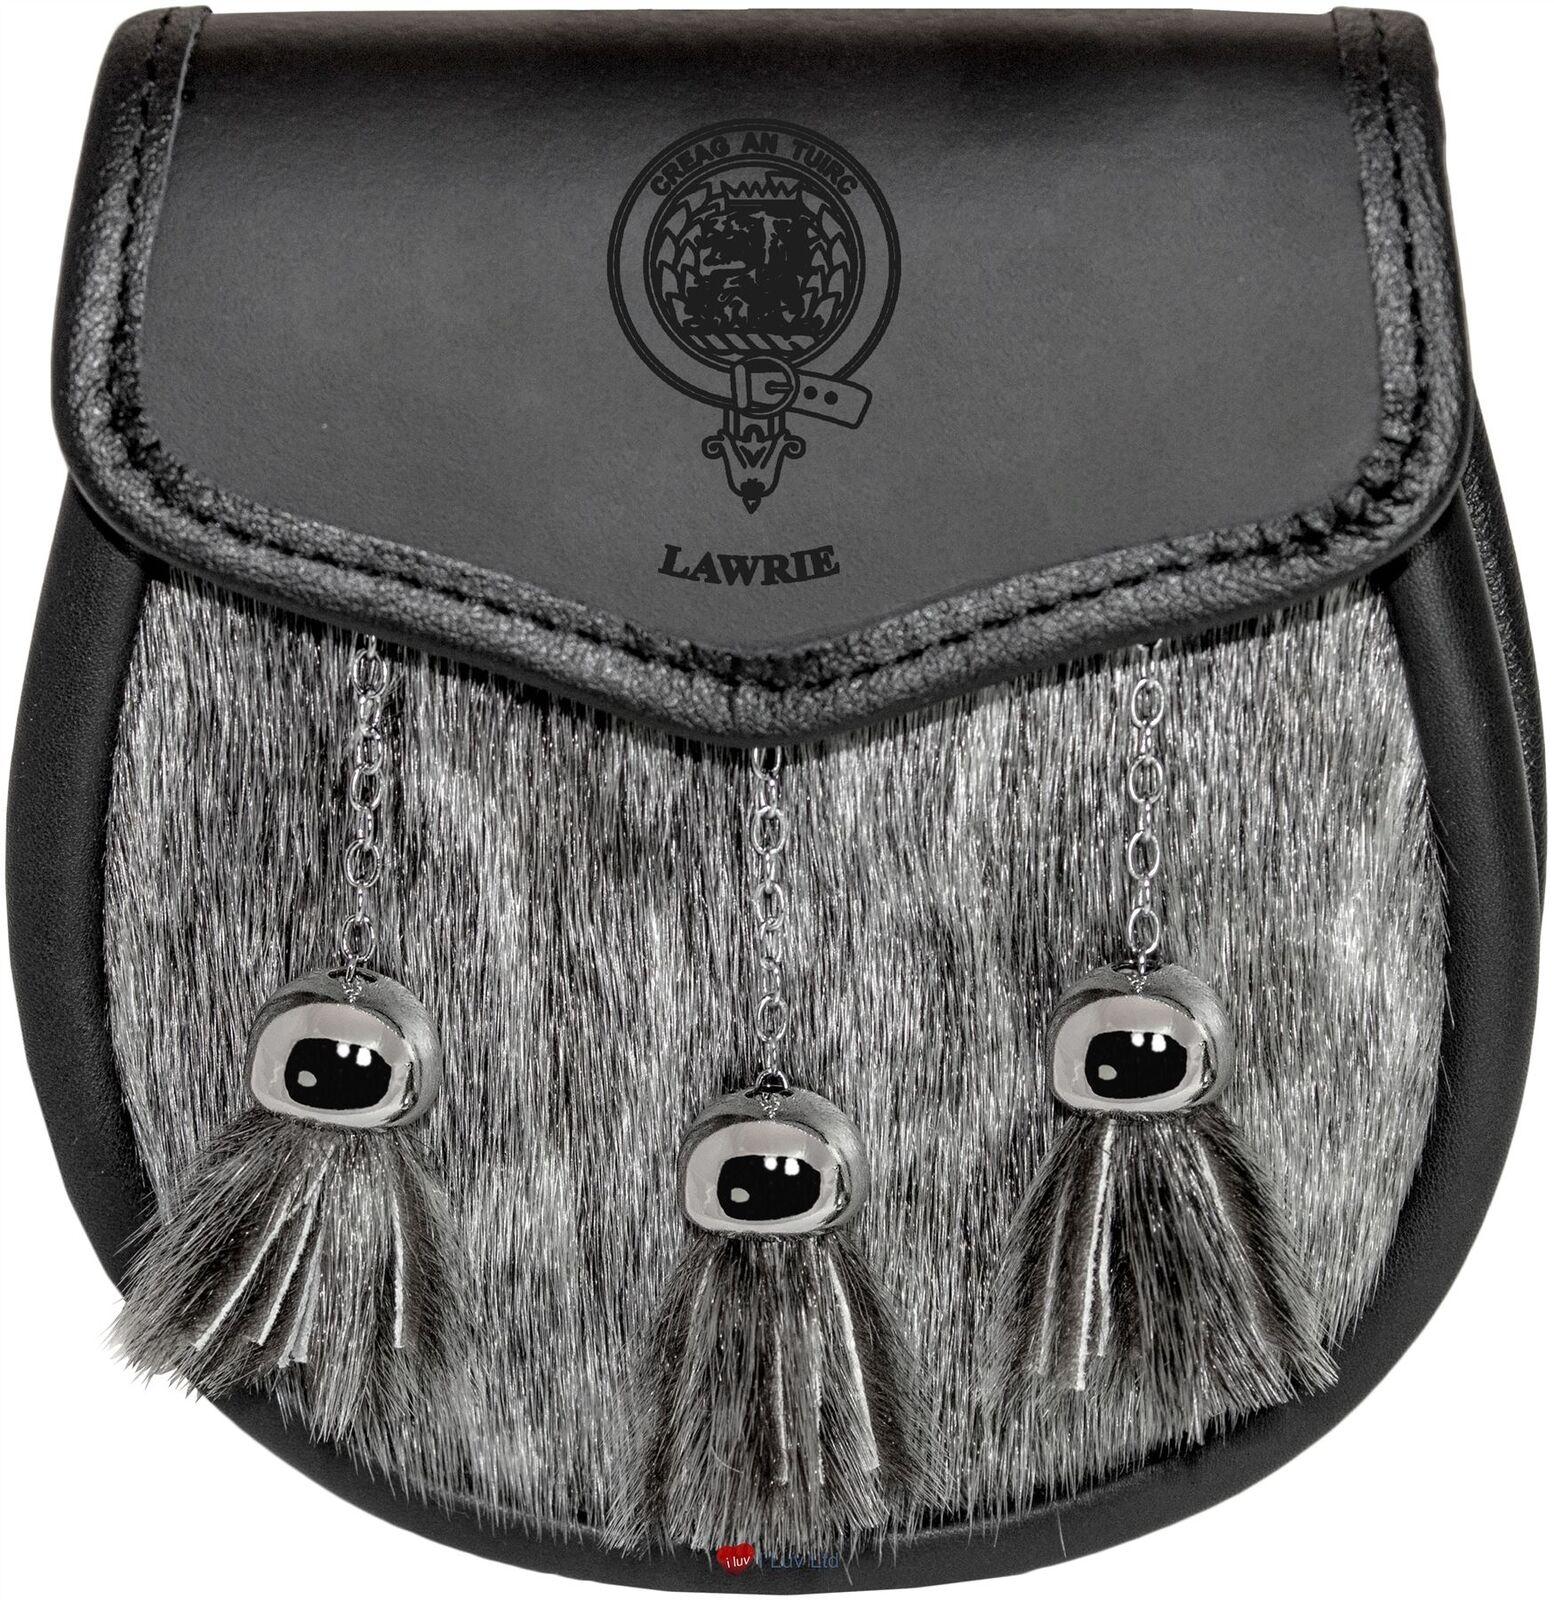 Lawrie Semi Dress Sporran Fur Plain Leather Flap Scottish Clan Crest